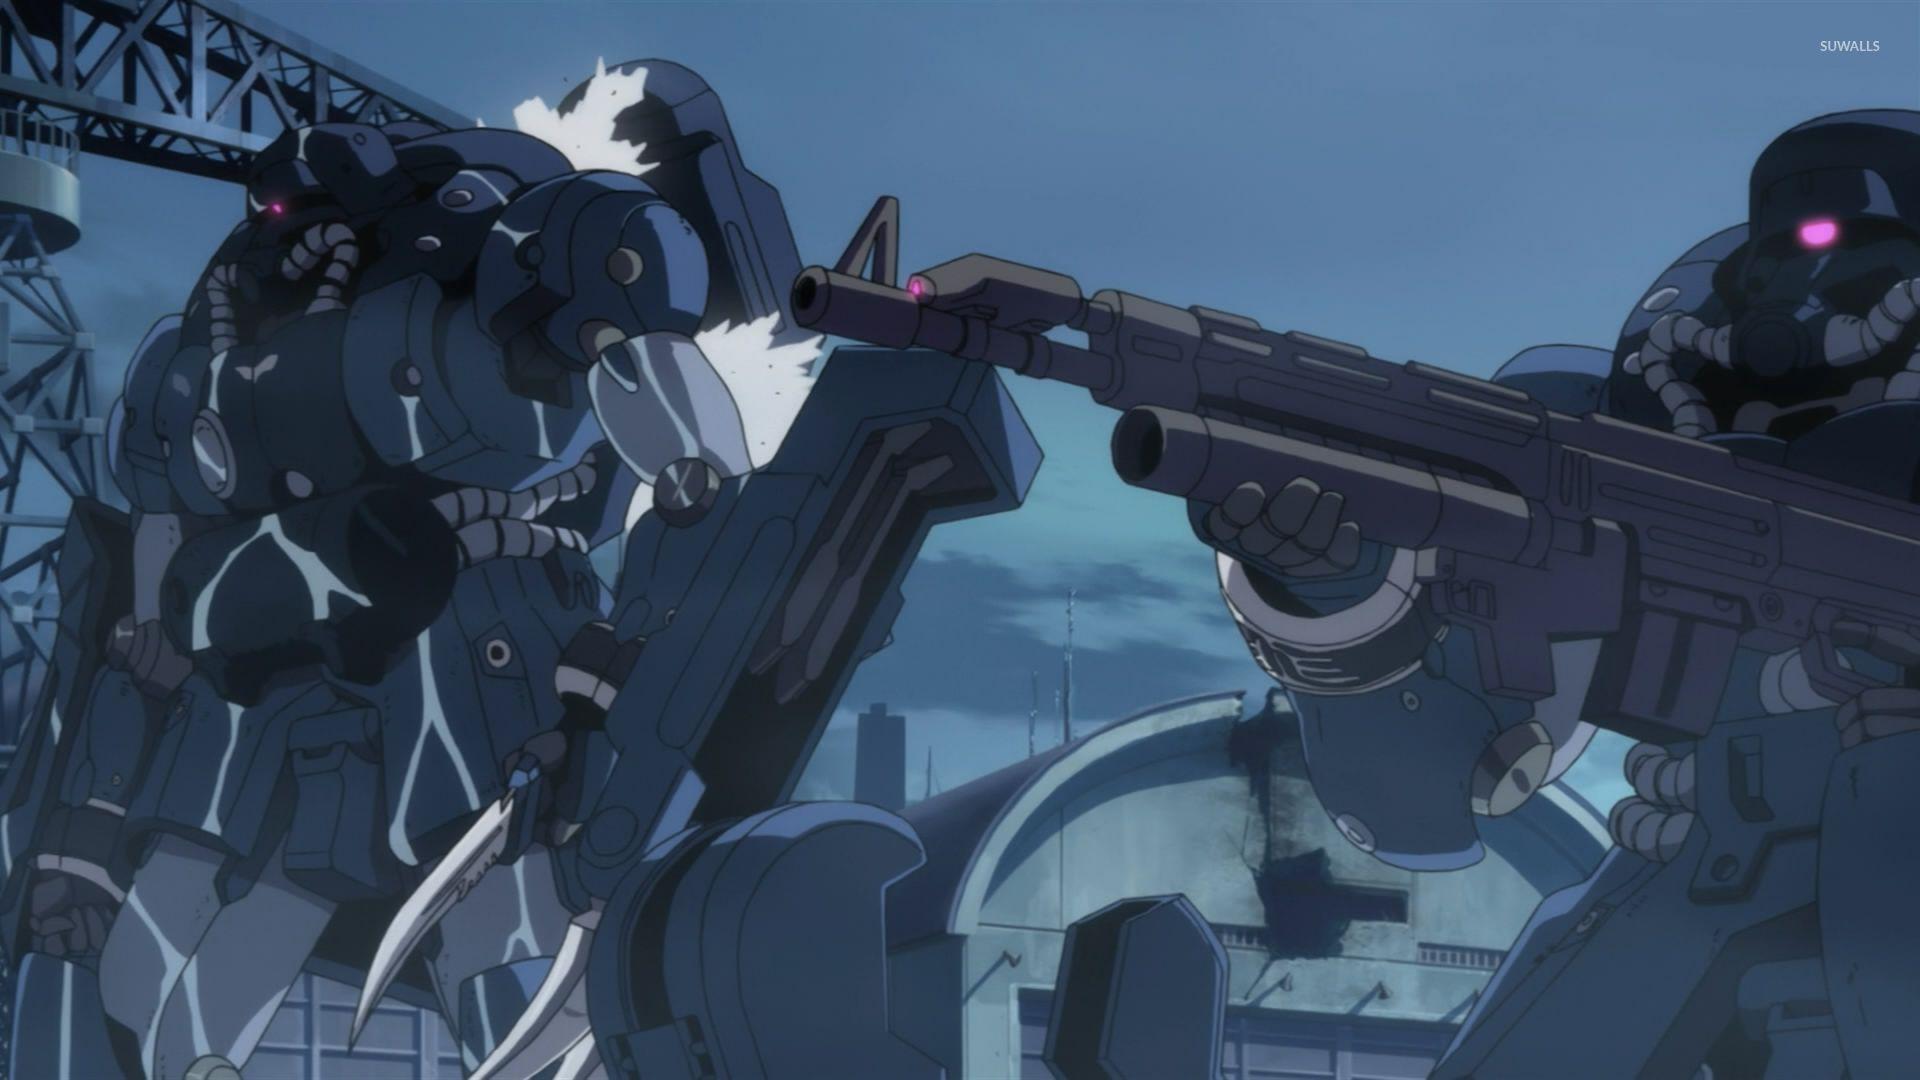 Mobile Suit Gundam Unicorn wallpaper - Anime wallpapers ...